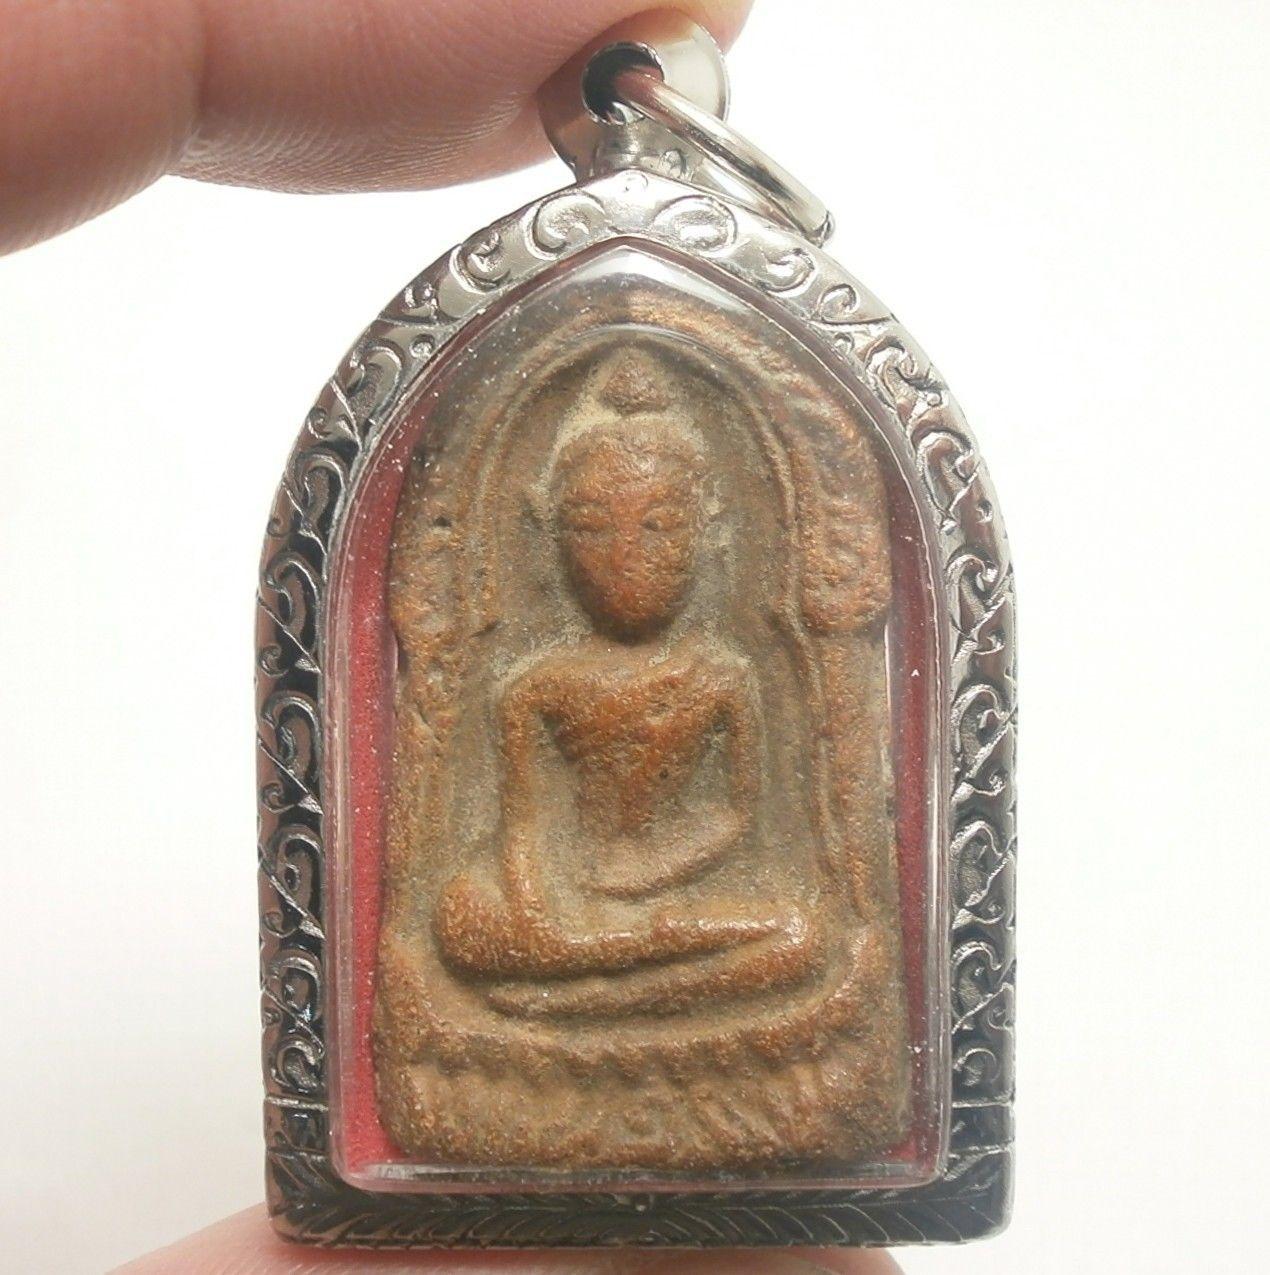 PHRA SOOMGOR MONEY RICH LUCKY HAPPY PEACEFUL LIFE THAI BUDDHA TOP AMULET PENDANT